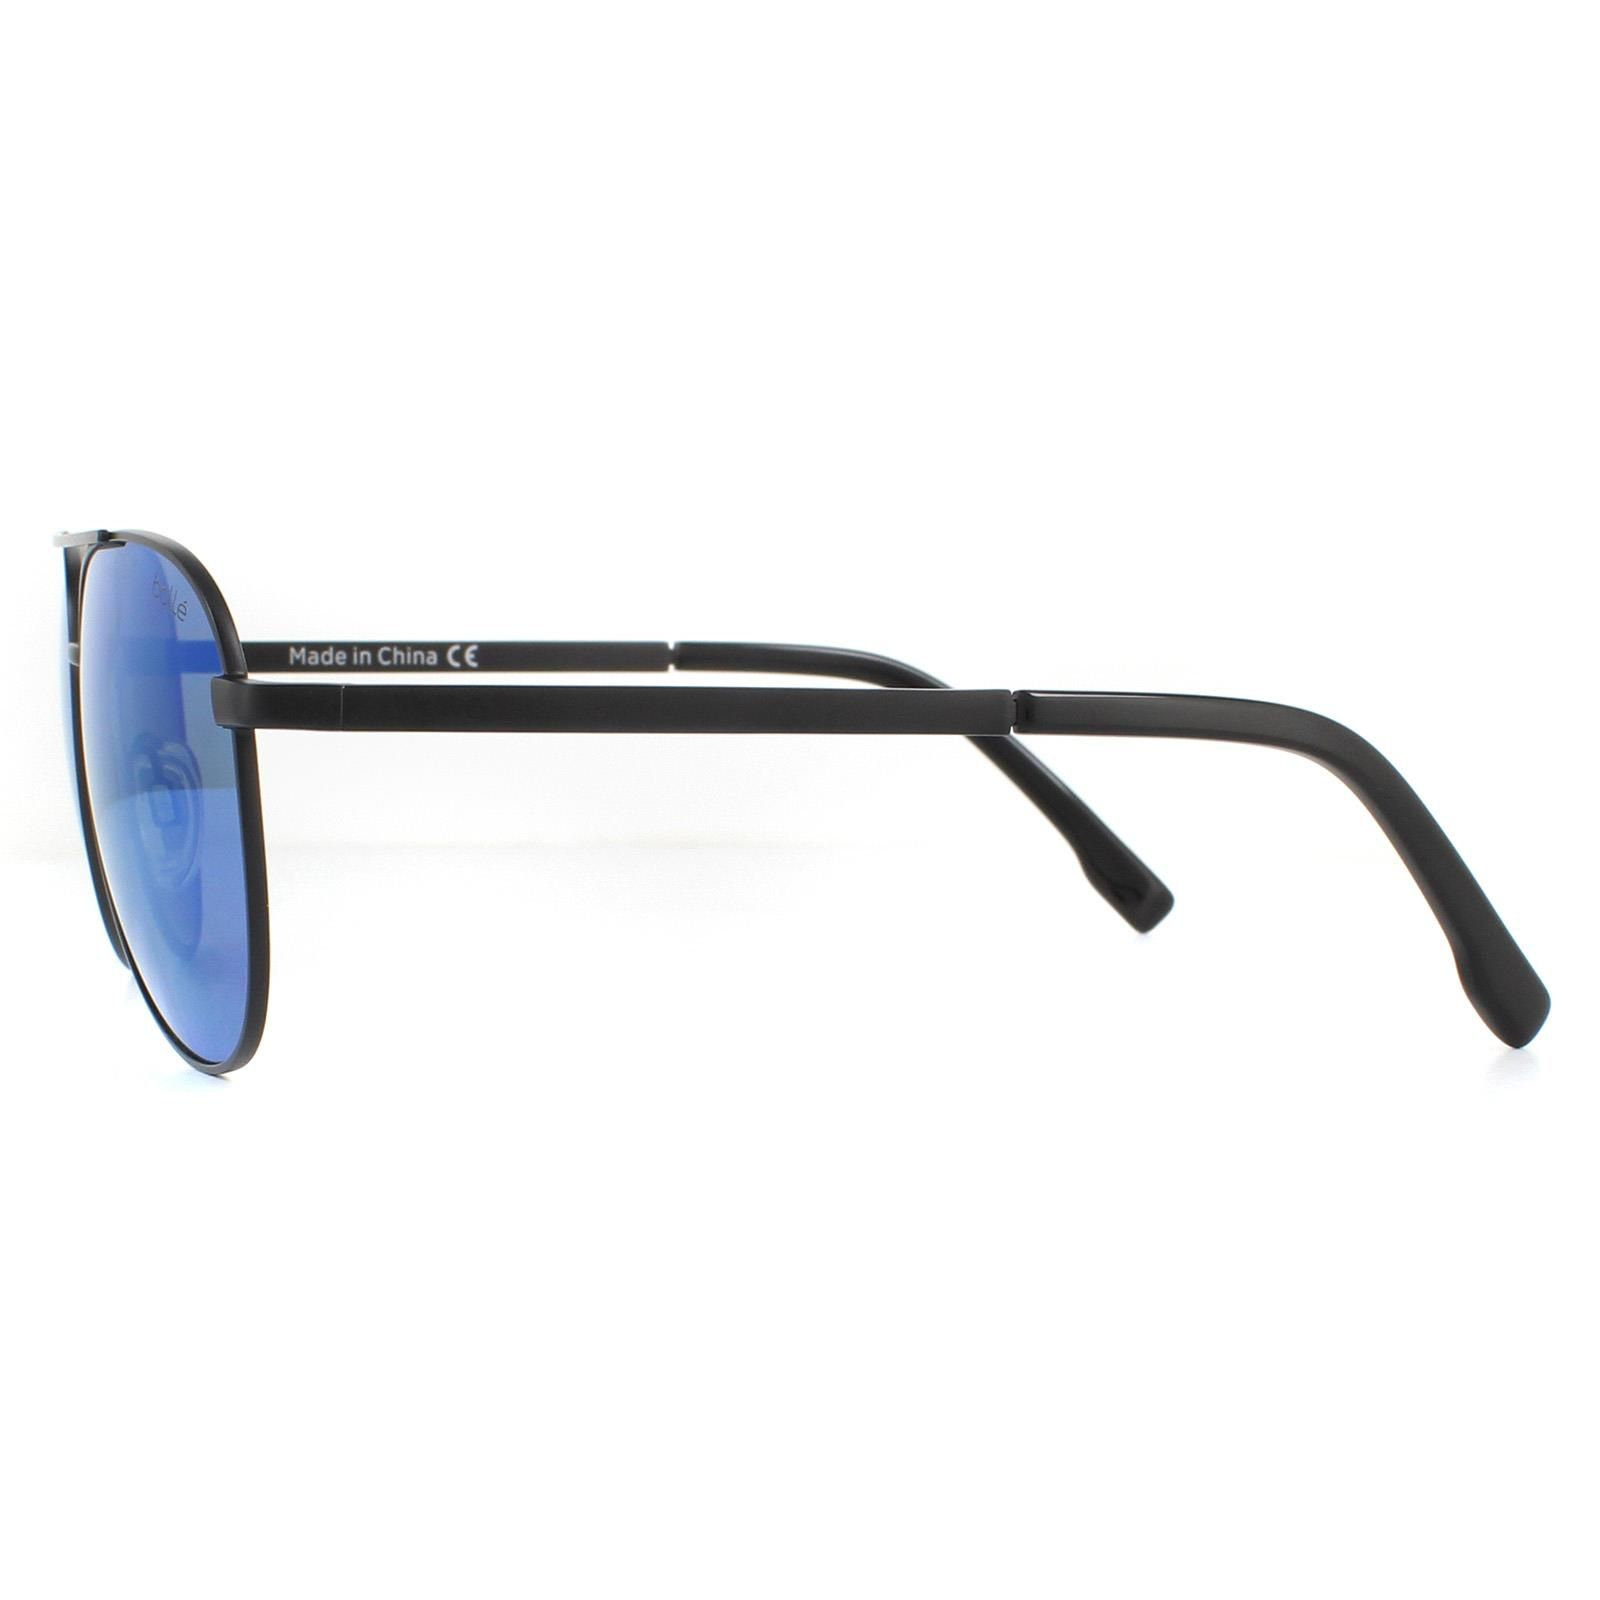 Bolle Sunglasses Evel 12536 Matte Black Offshore Blue Polarized